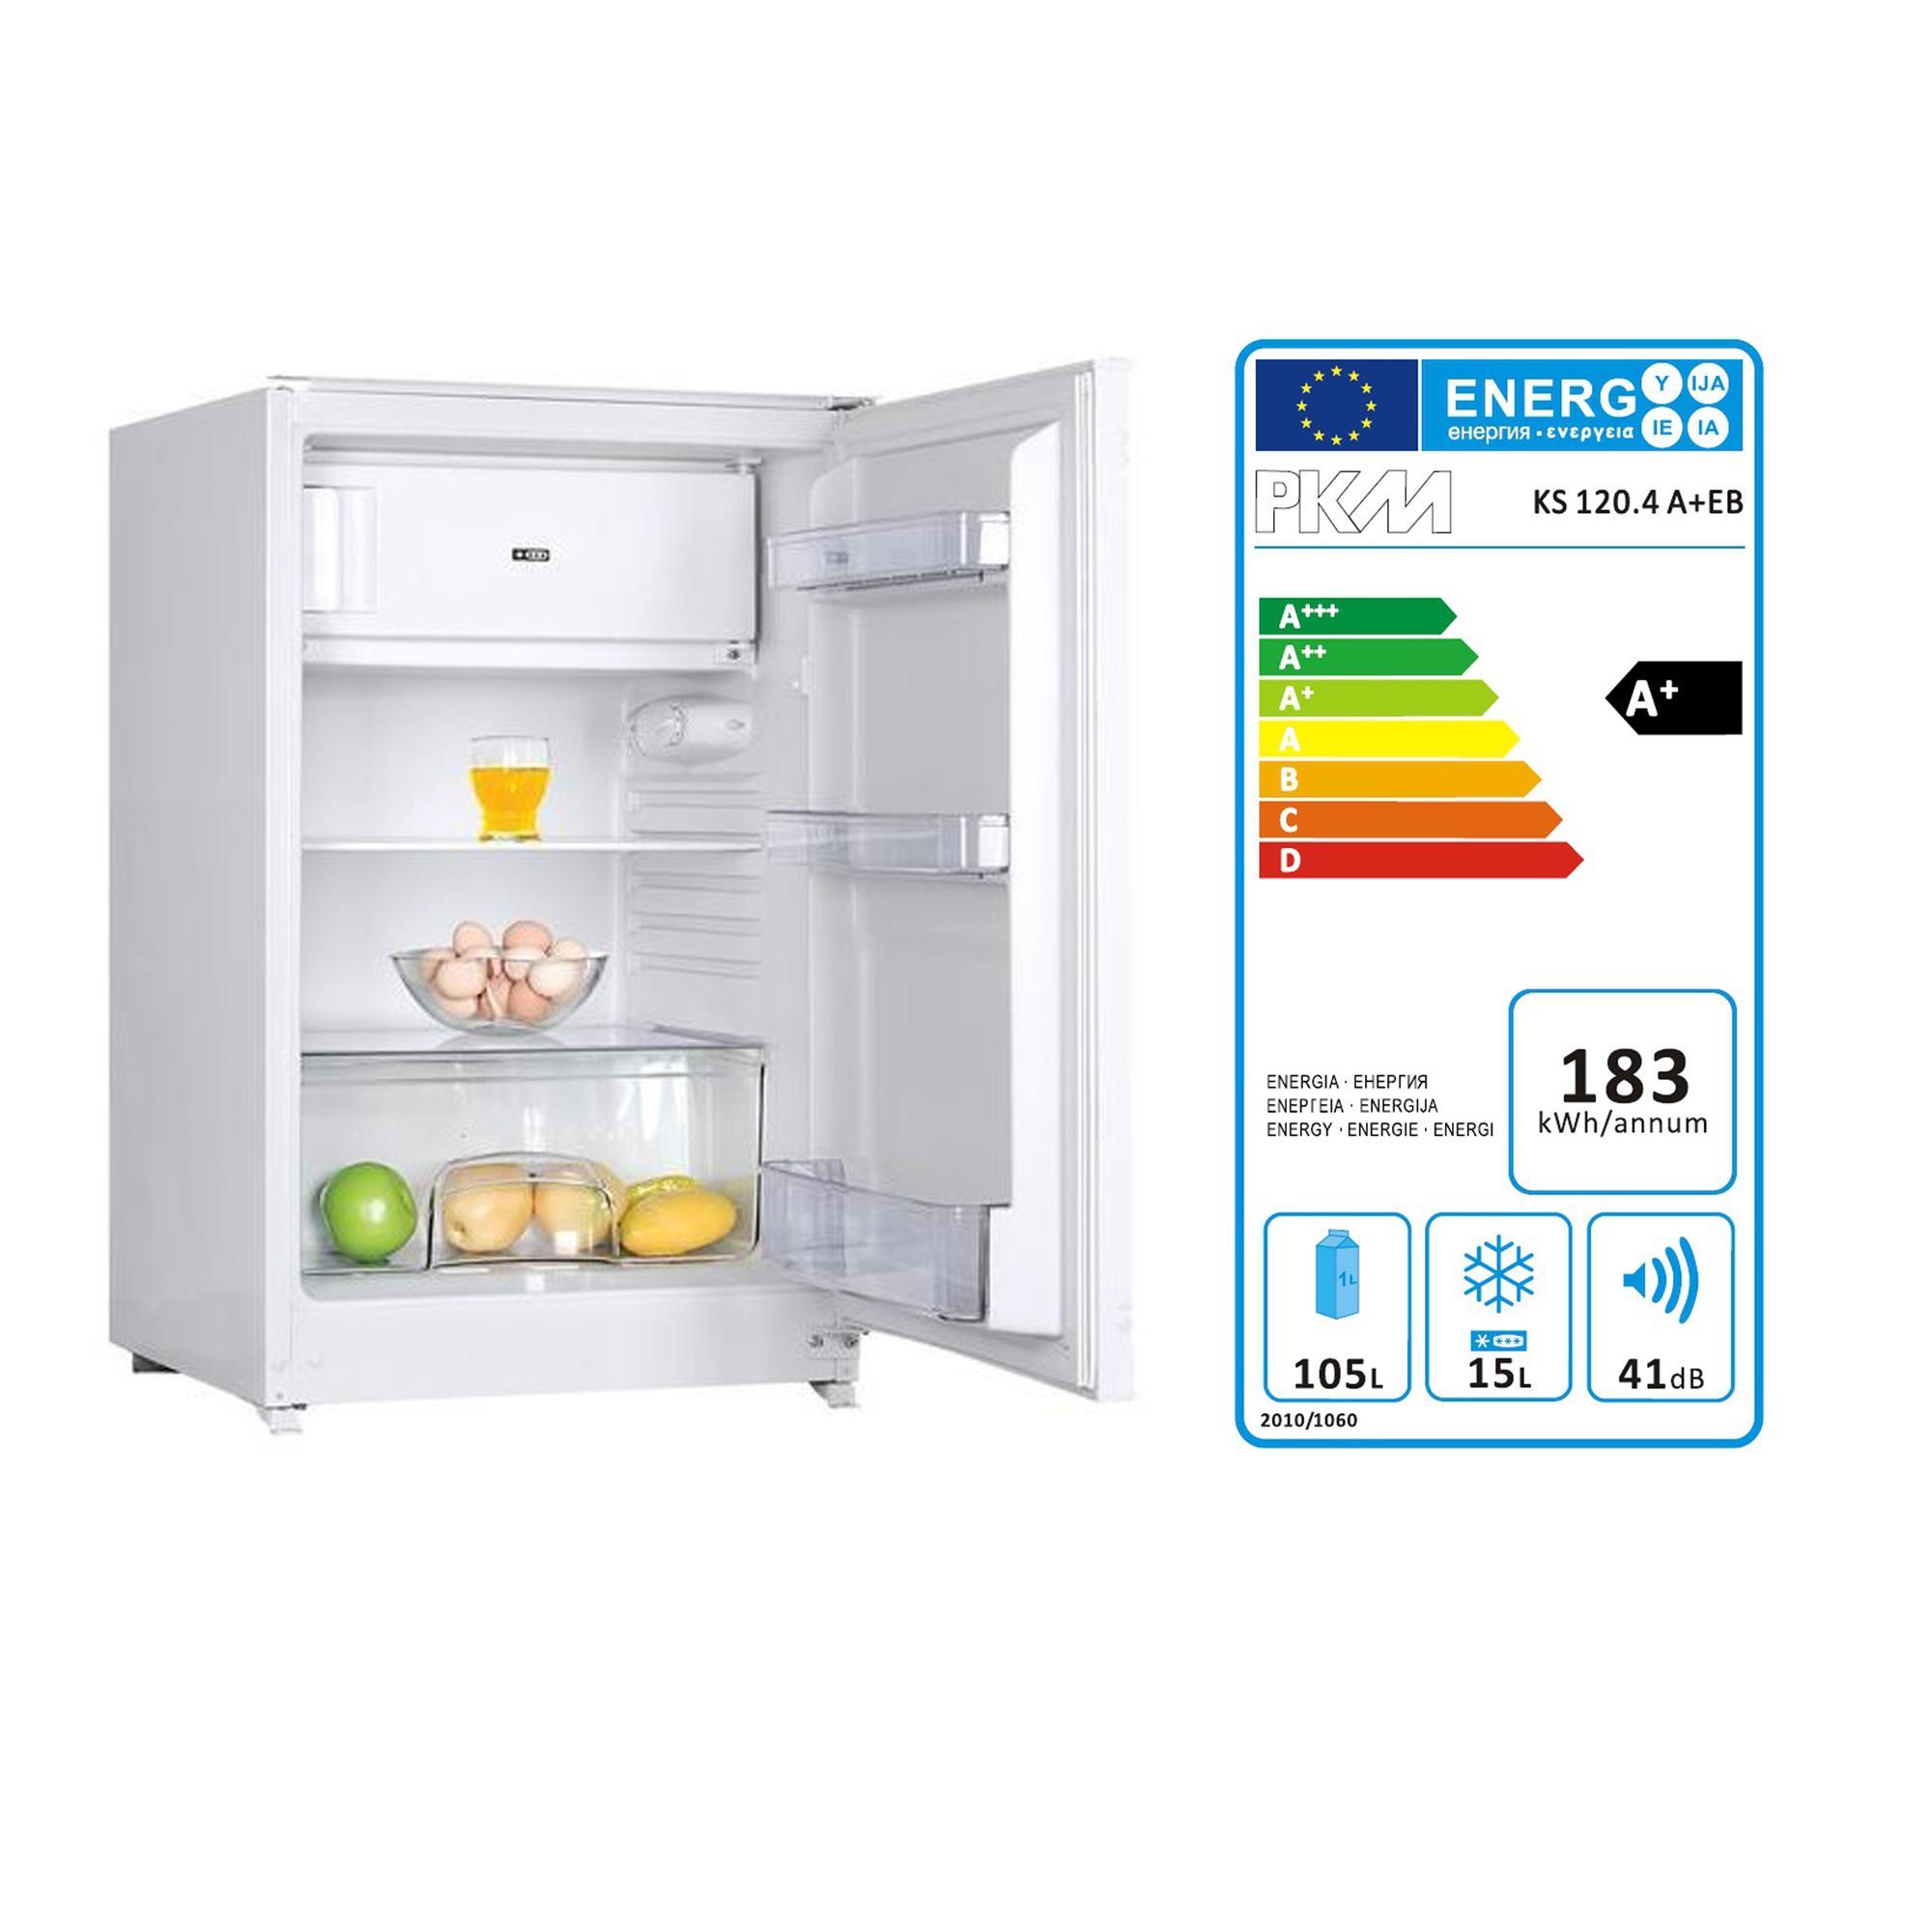 120 Cm Singleküche Mit Kühlschrank